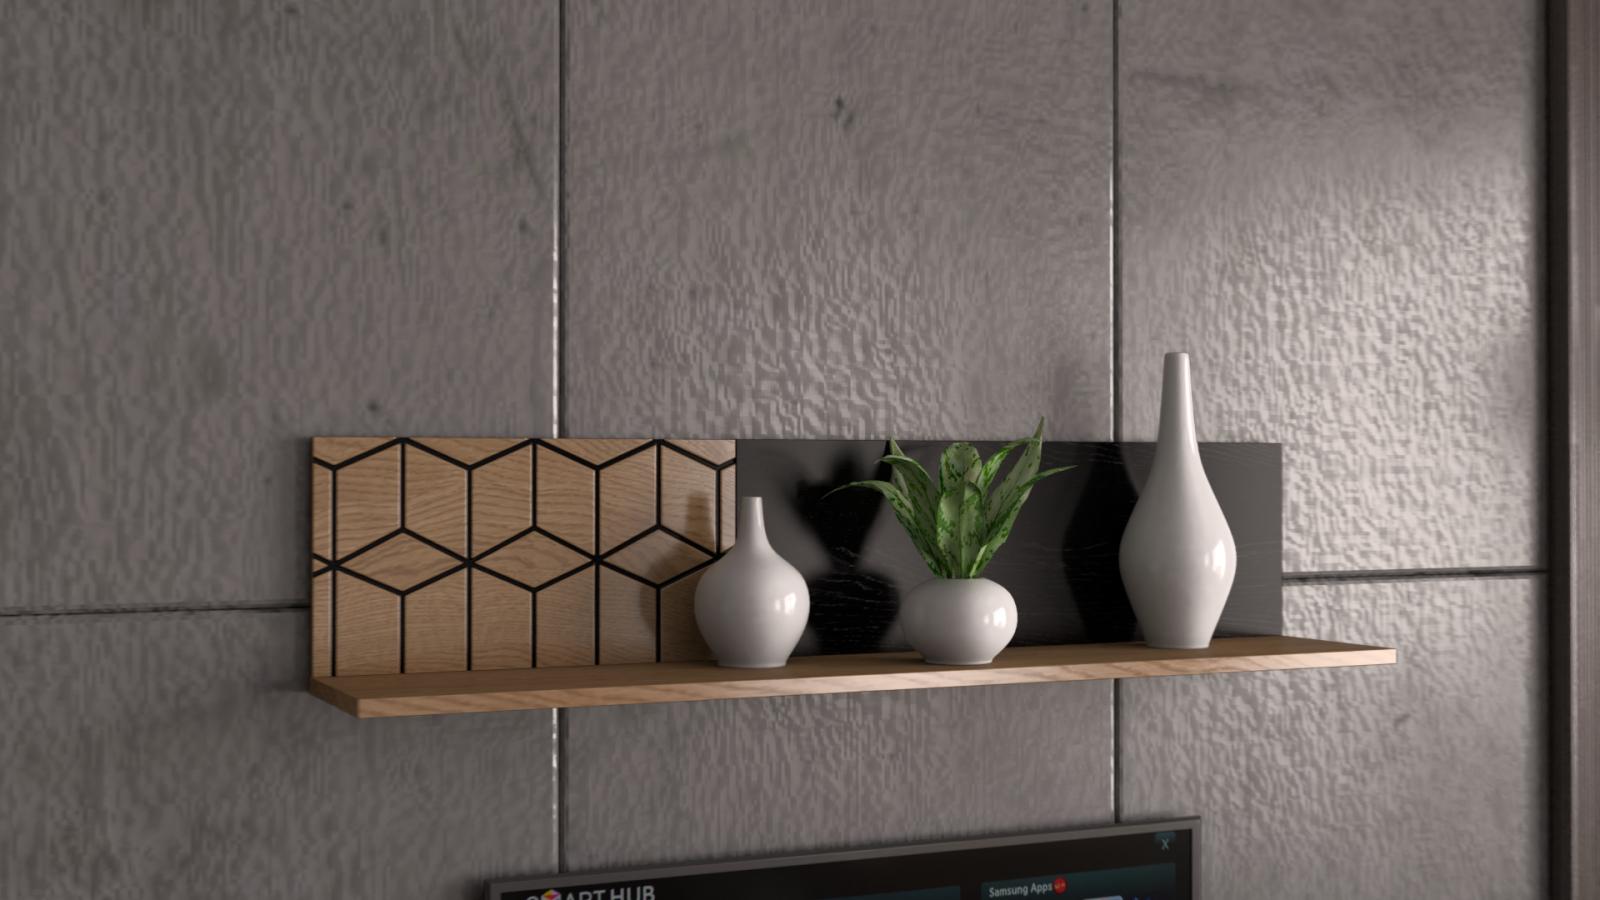 mozaic קולקציה רהיטים לסלון בסגנון מודרני